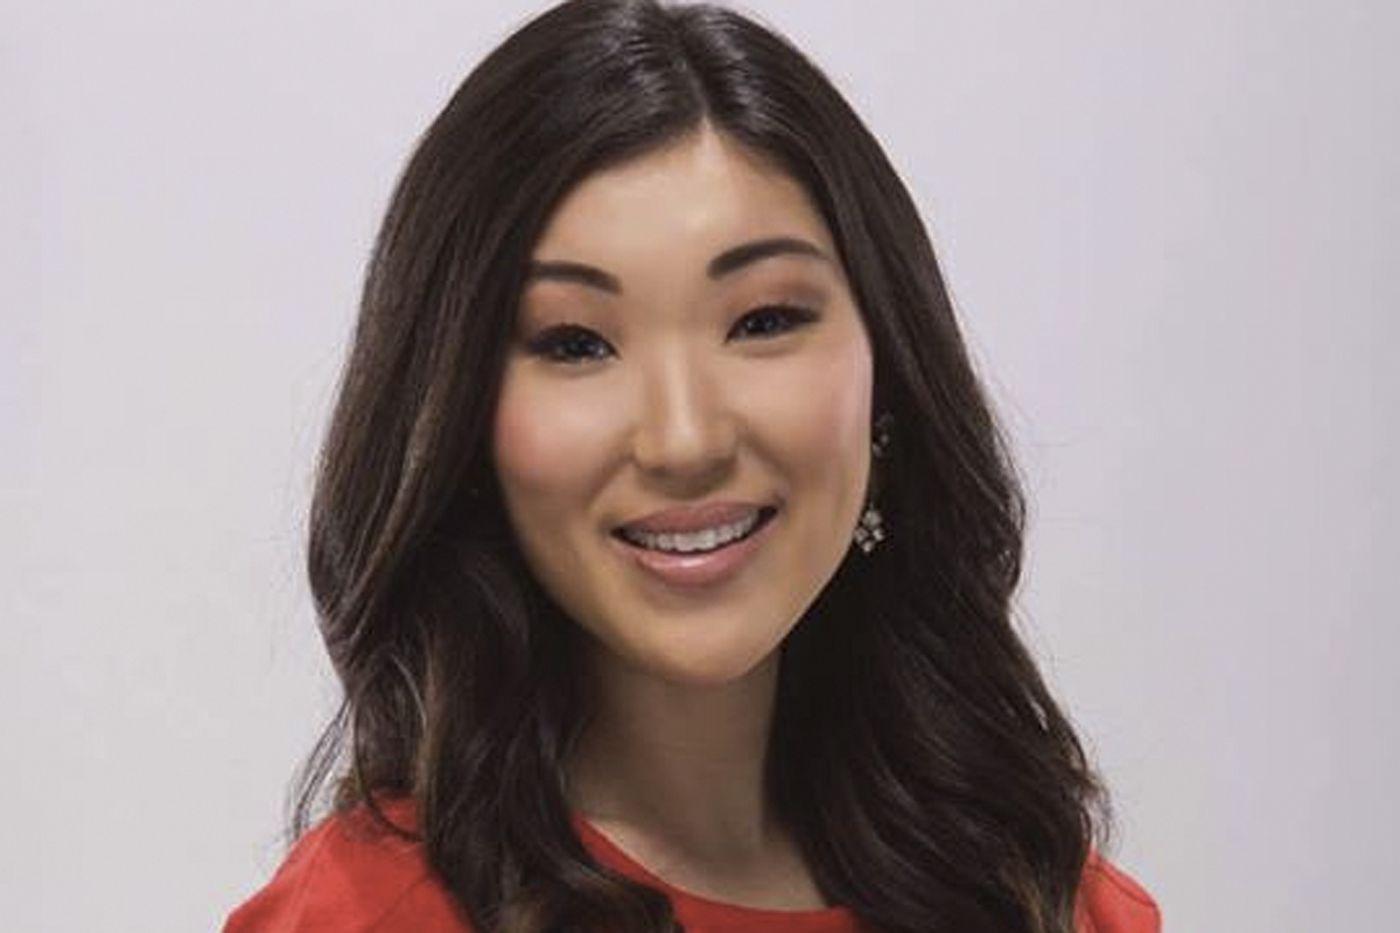 CBS3 reporter Anita Oh leaves TV for University of Pennsylvania Law School